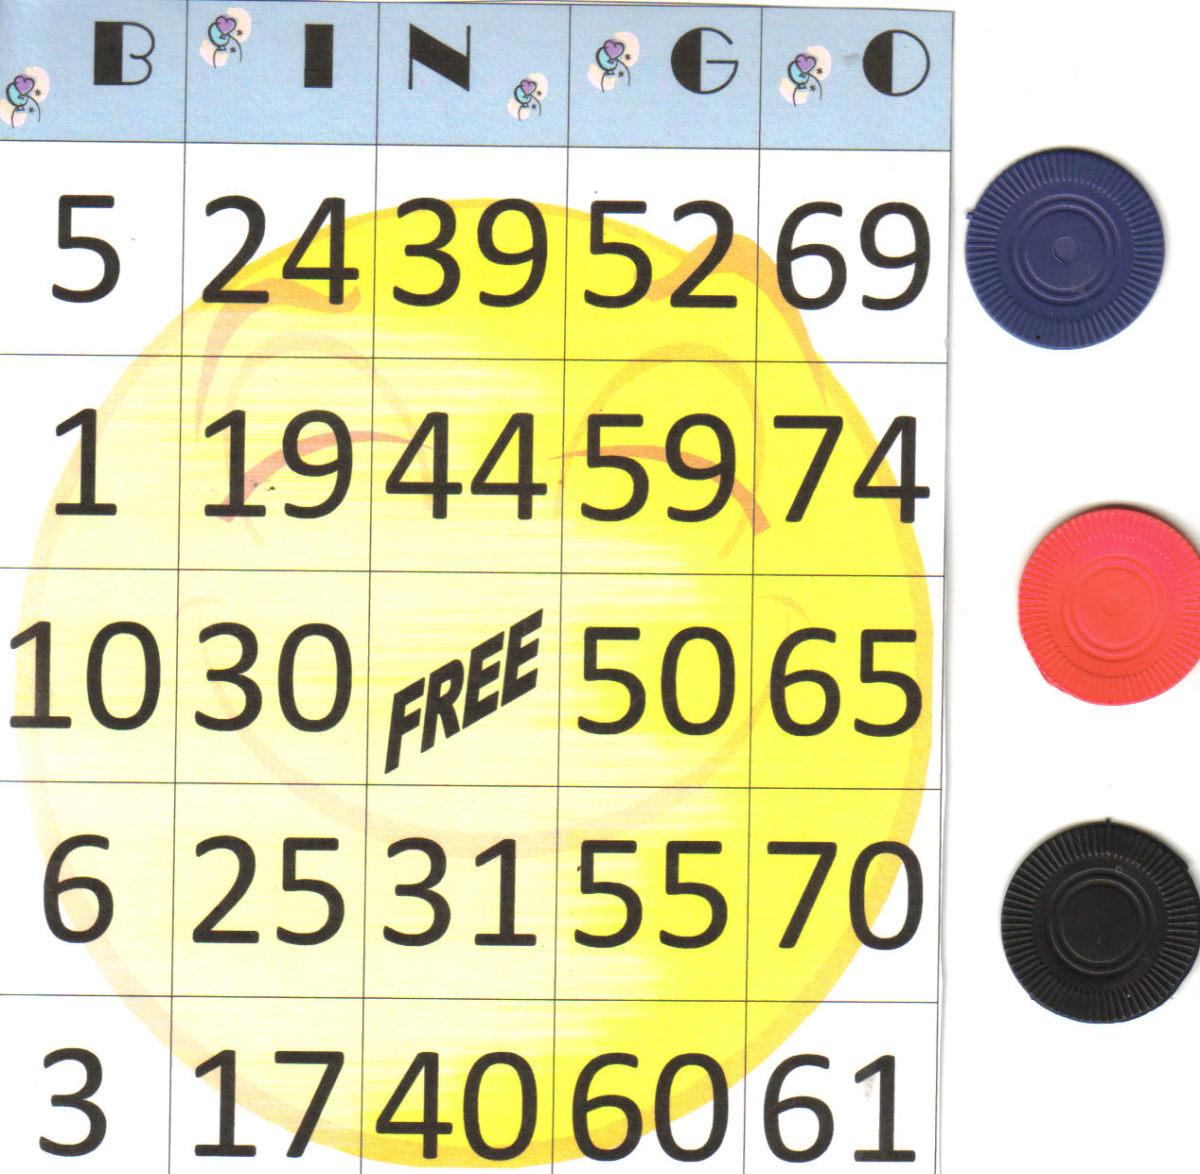 Create your own Bingo cards.